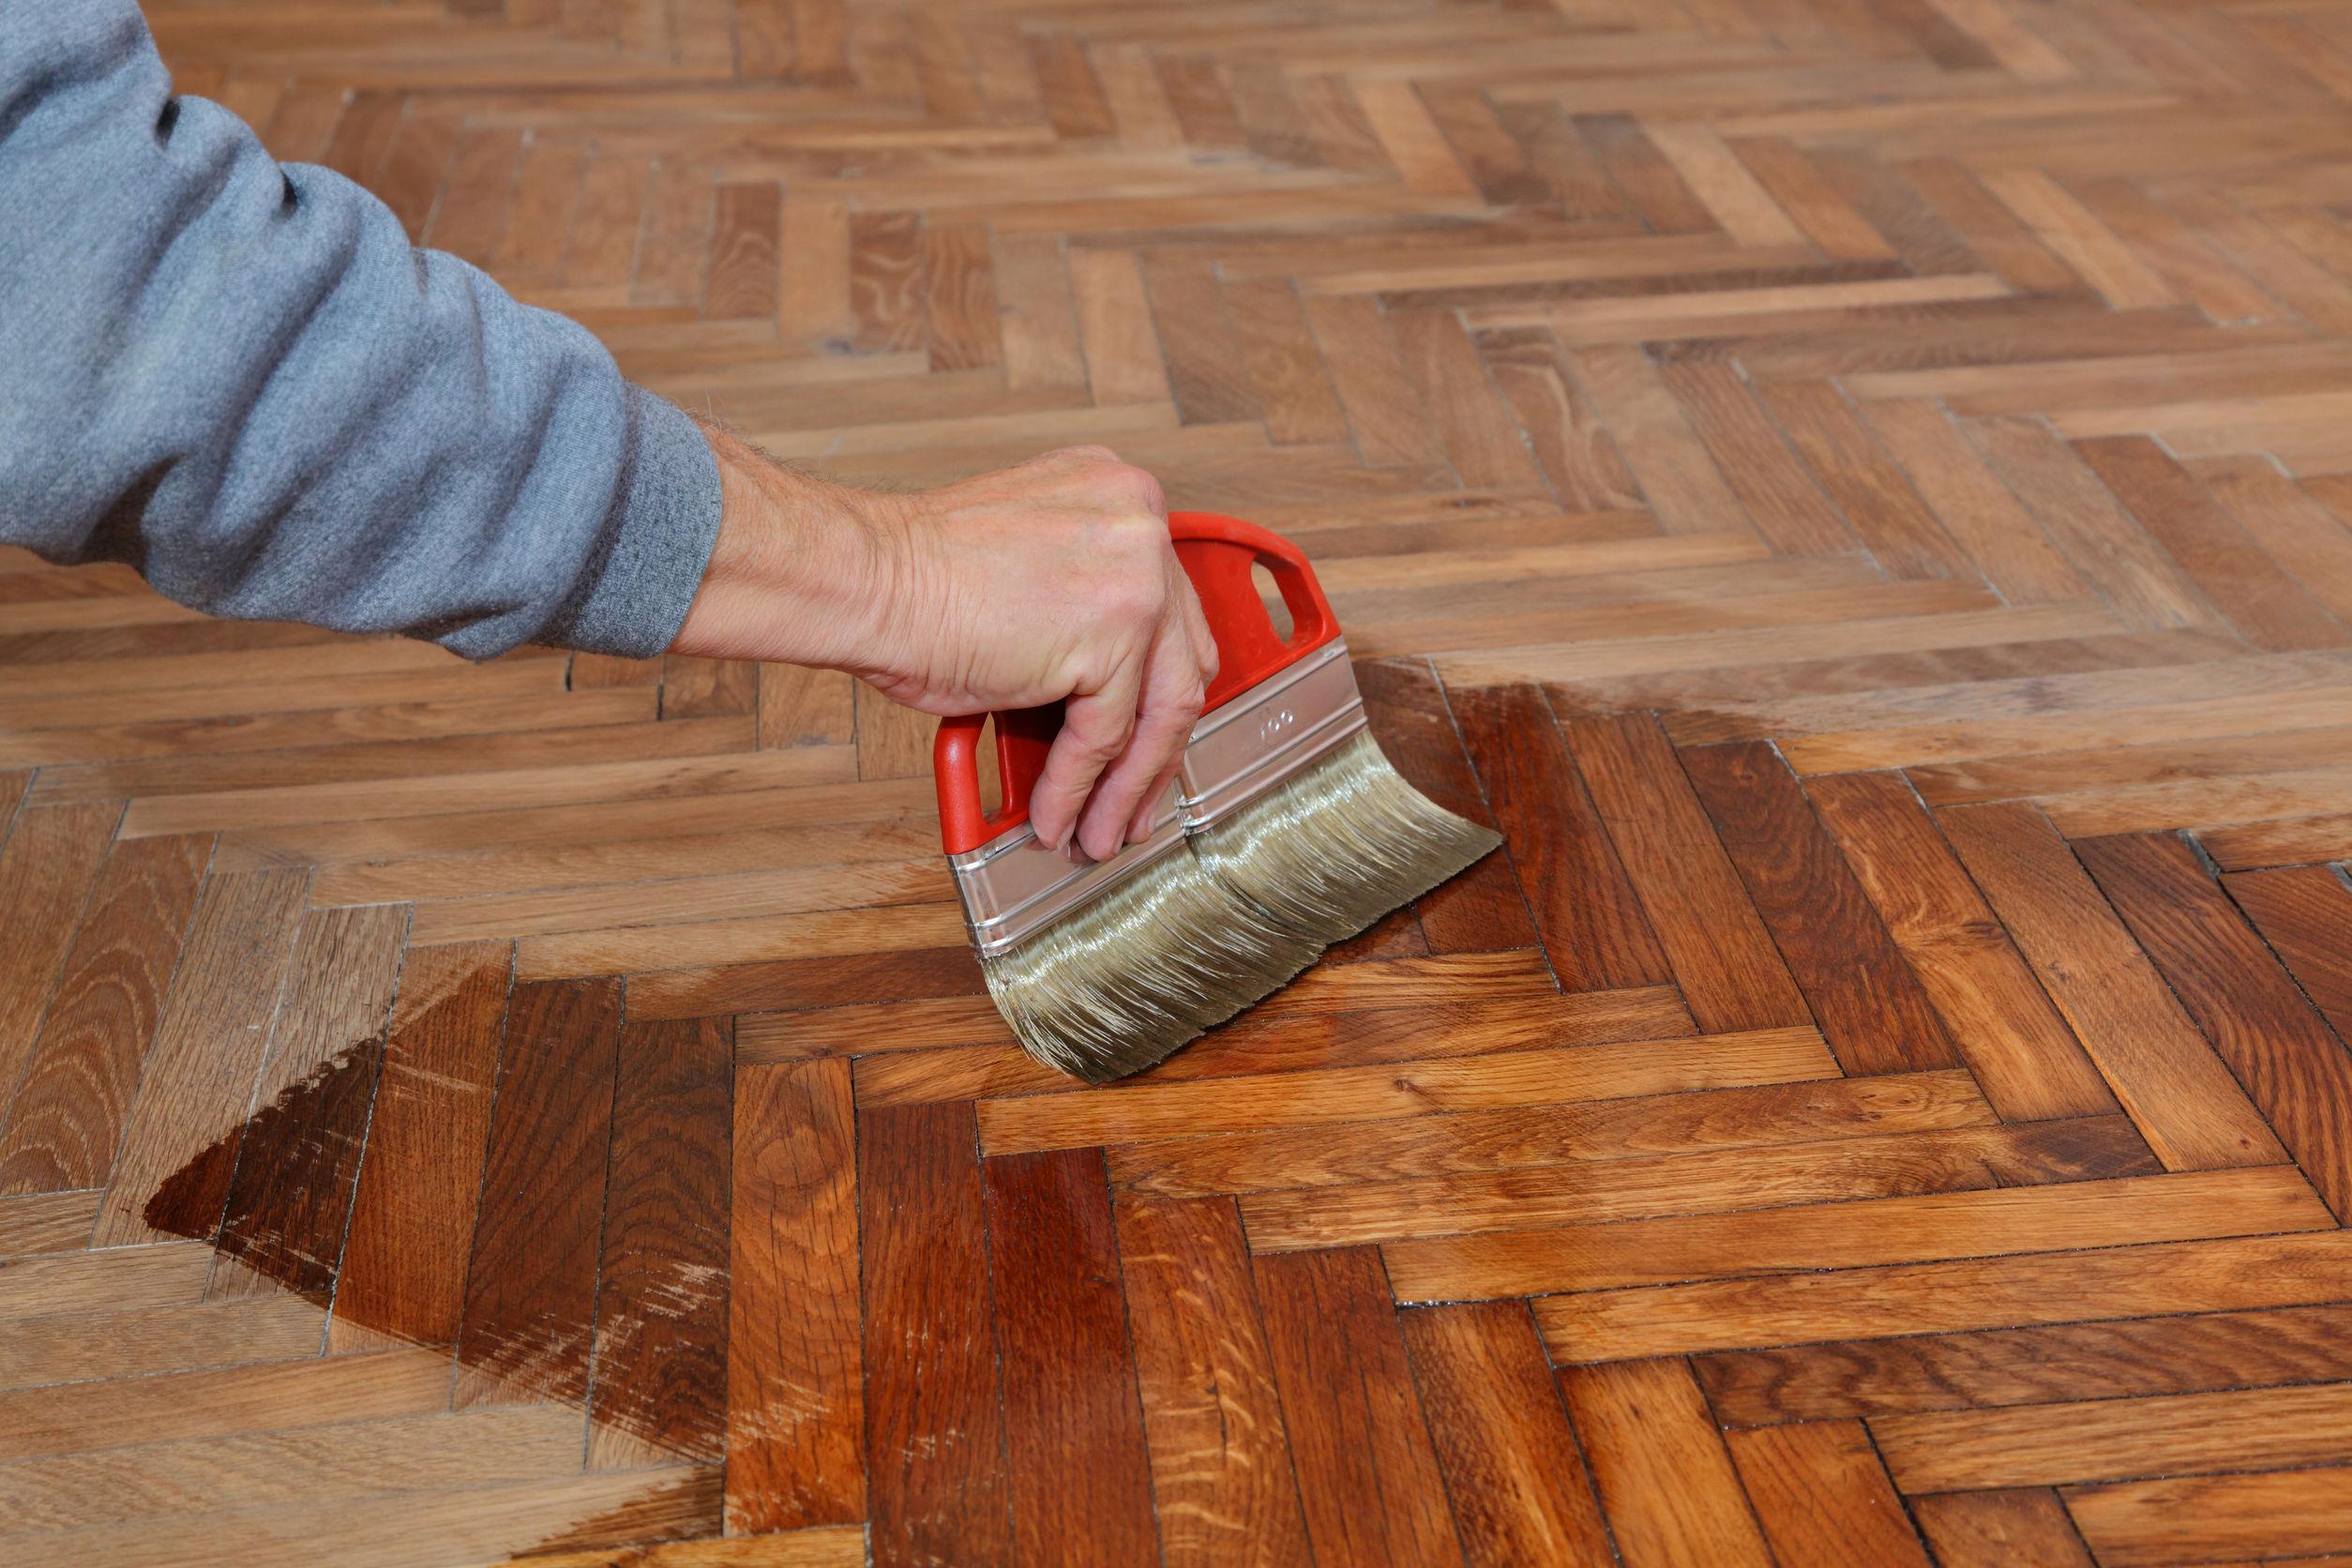 22815687 Varnishing Of Oak Parquet Floor Workers Hand And Brush